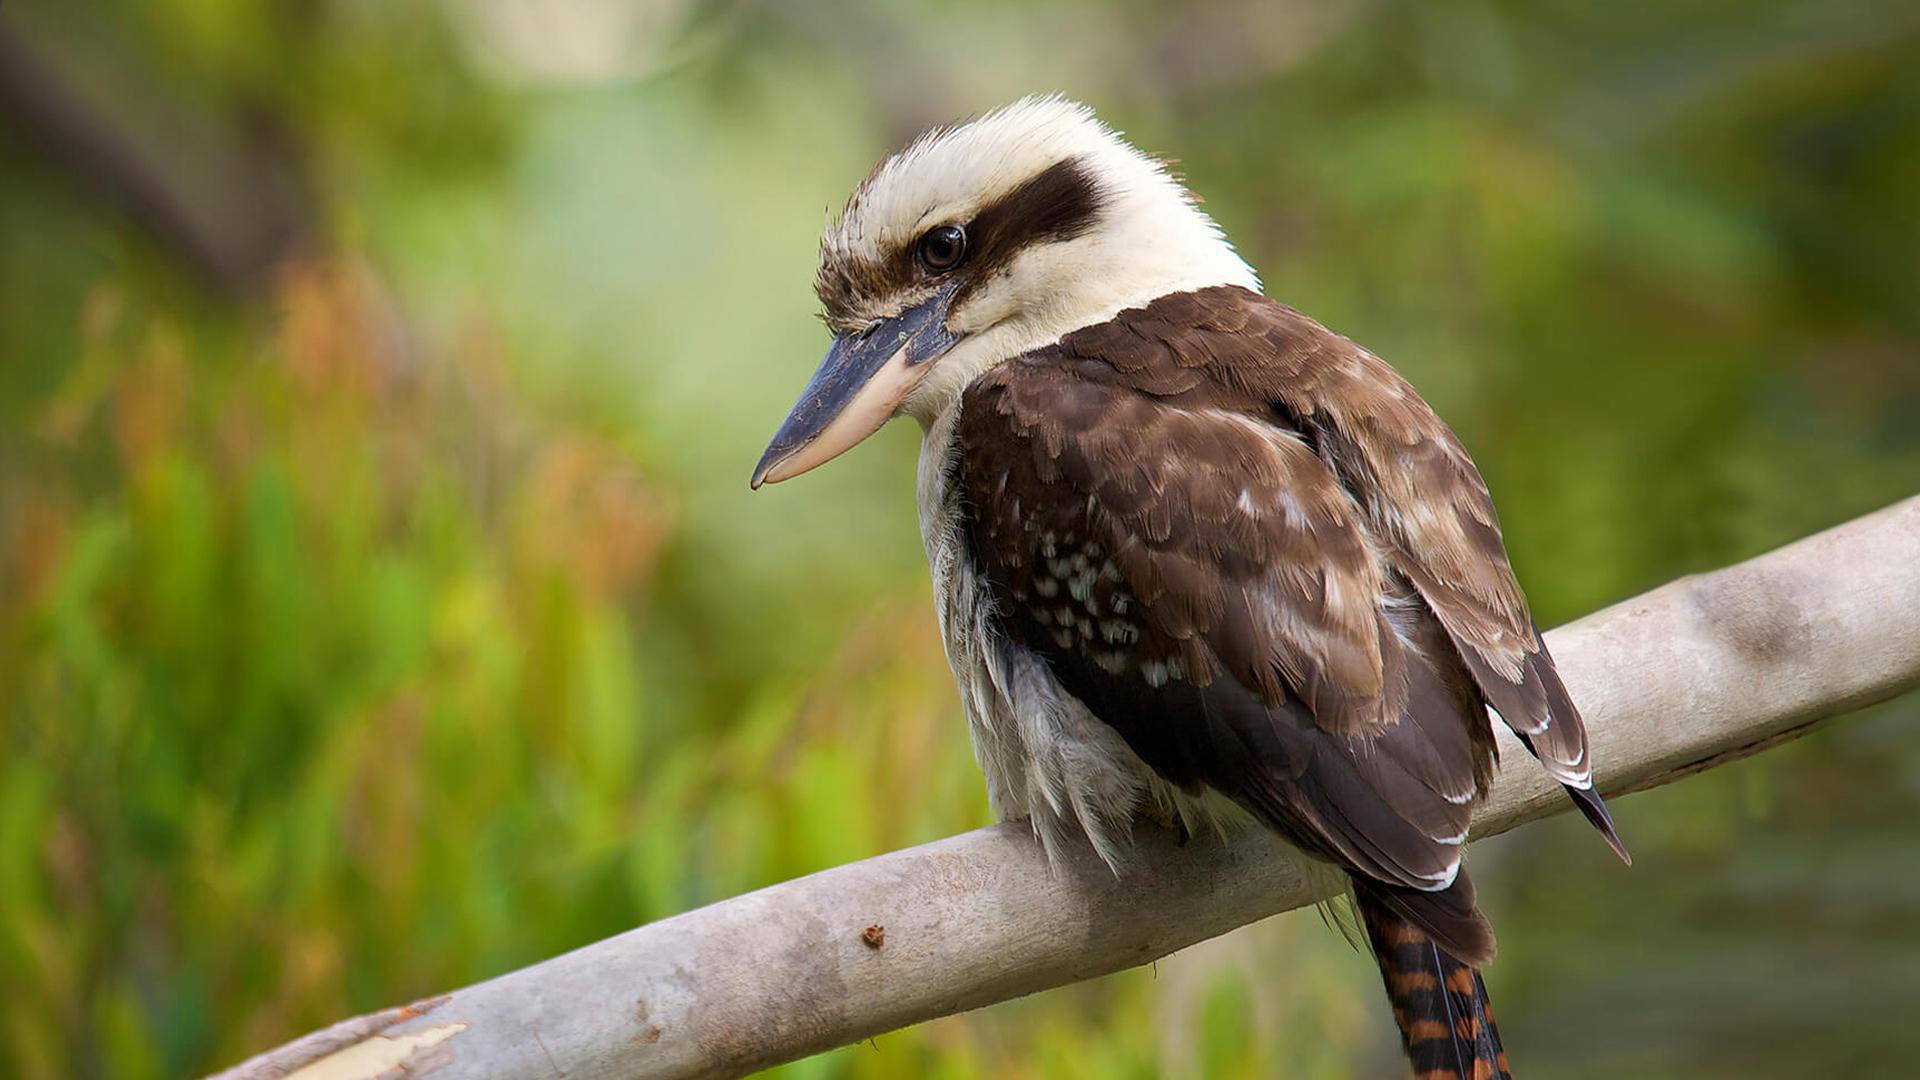 Laughing Kookaburra | San Diego Zoo Animals & Plants - photo#4